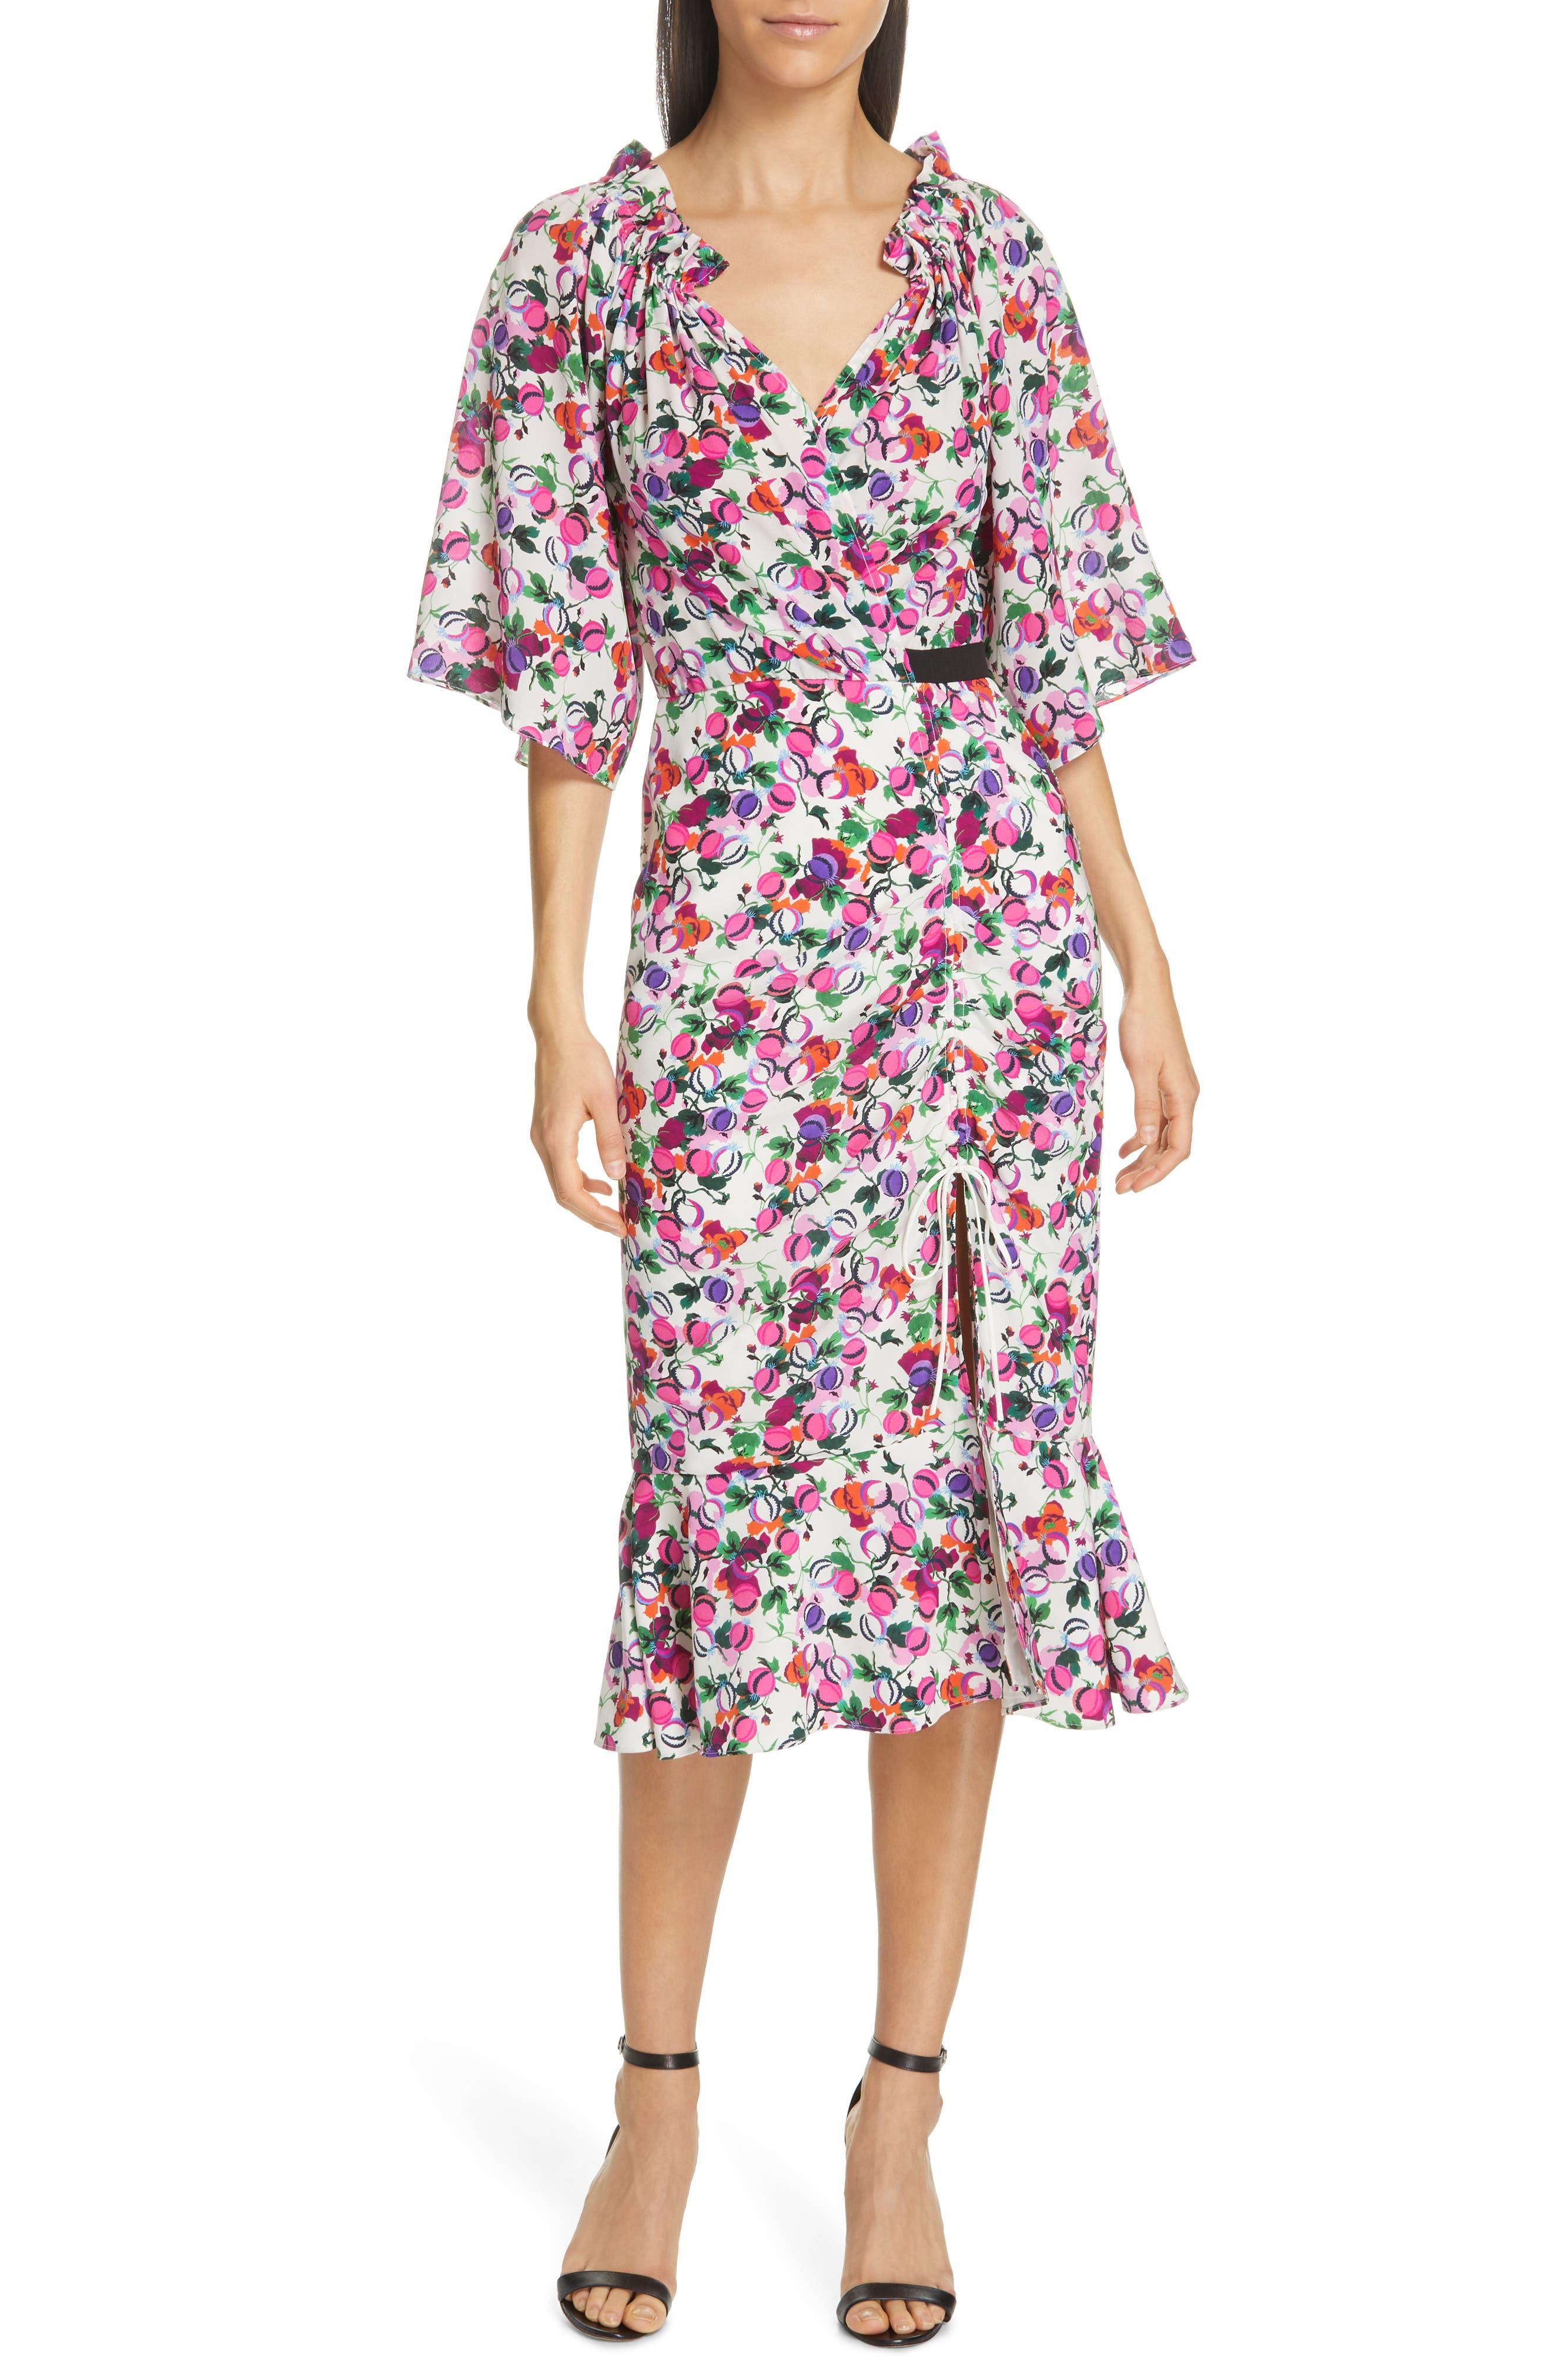 SALONI, Olivia Floral Print Off the Shoulder Midi Dress, Main thumbnail 1, color, ROSE BOUNTY BLACK